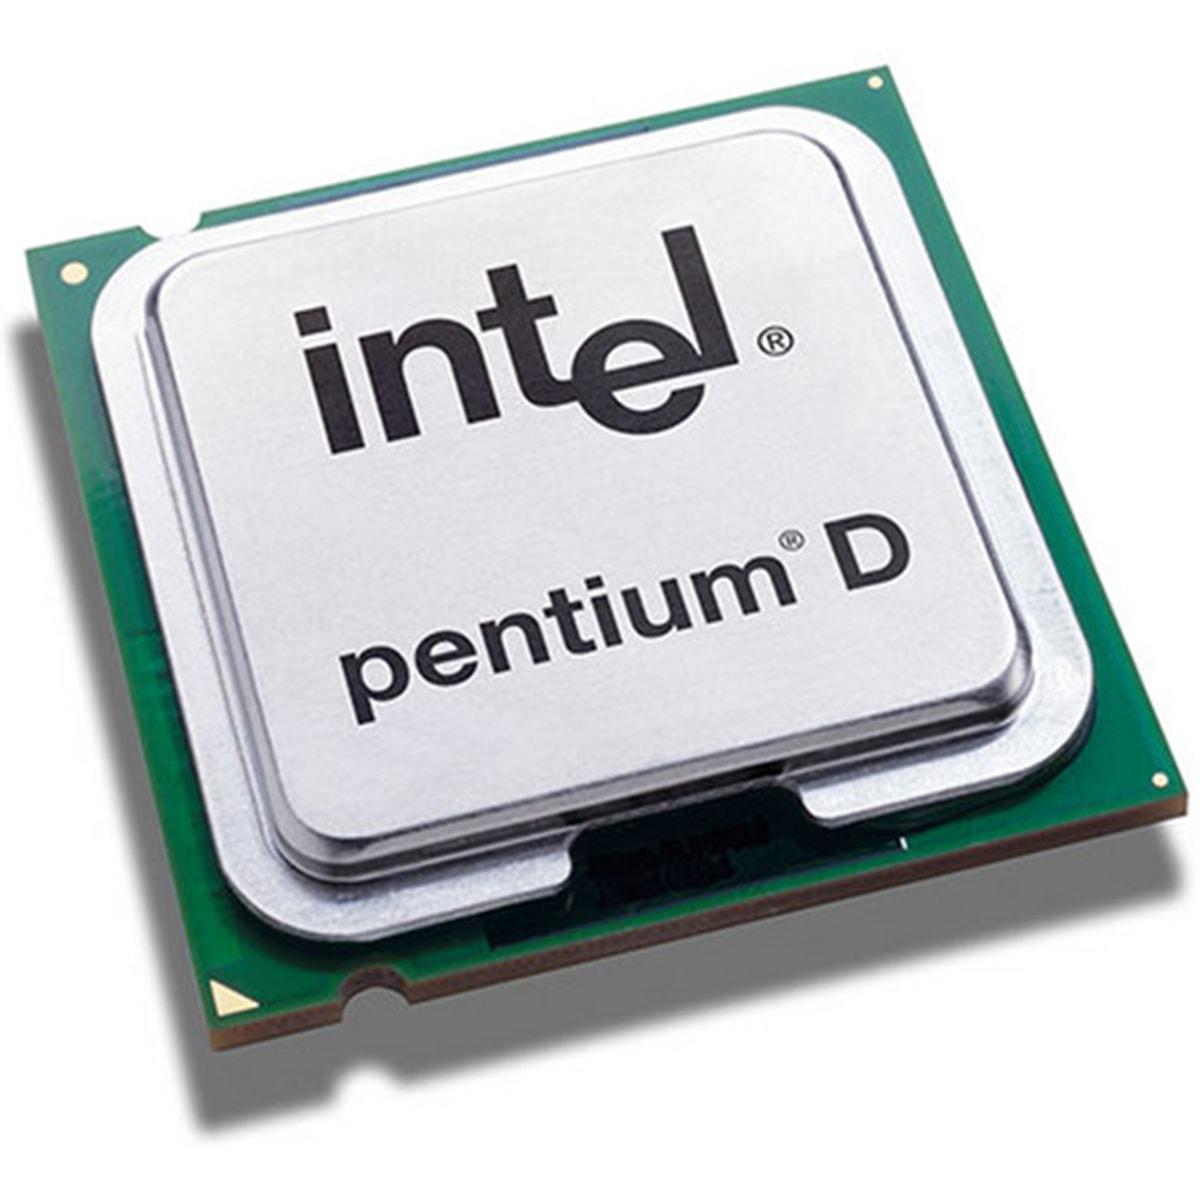 Processador Intel Pentium D 915 2,80Ghz 4M Cache 800MHz - Socket 775 - Seminovo